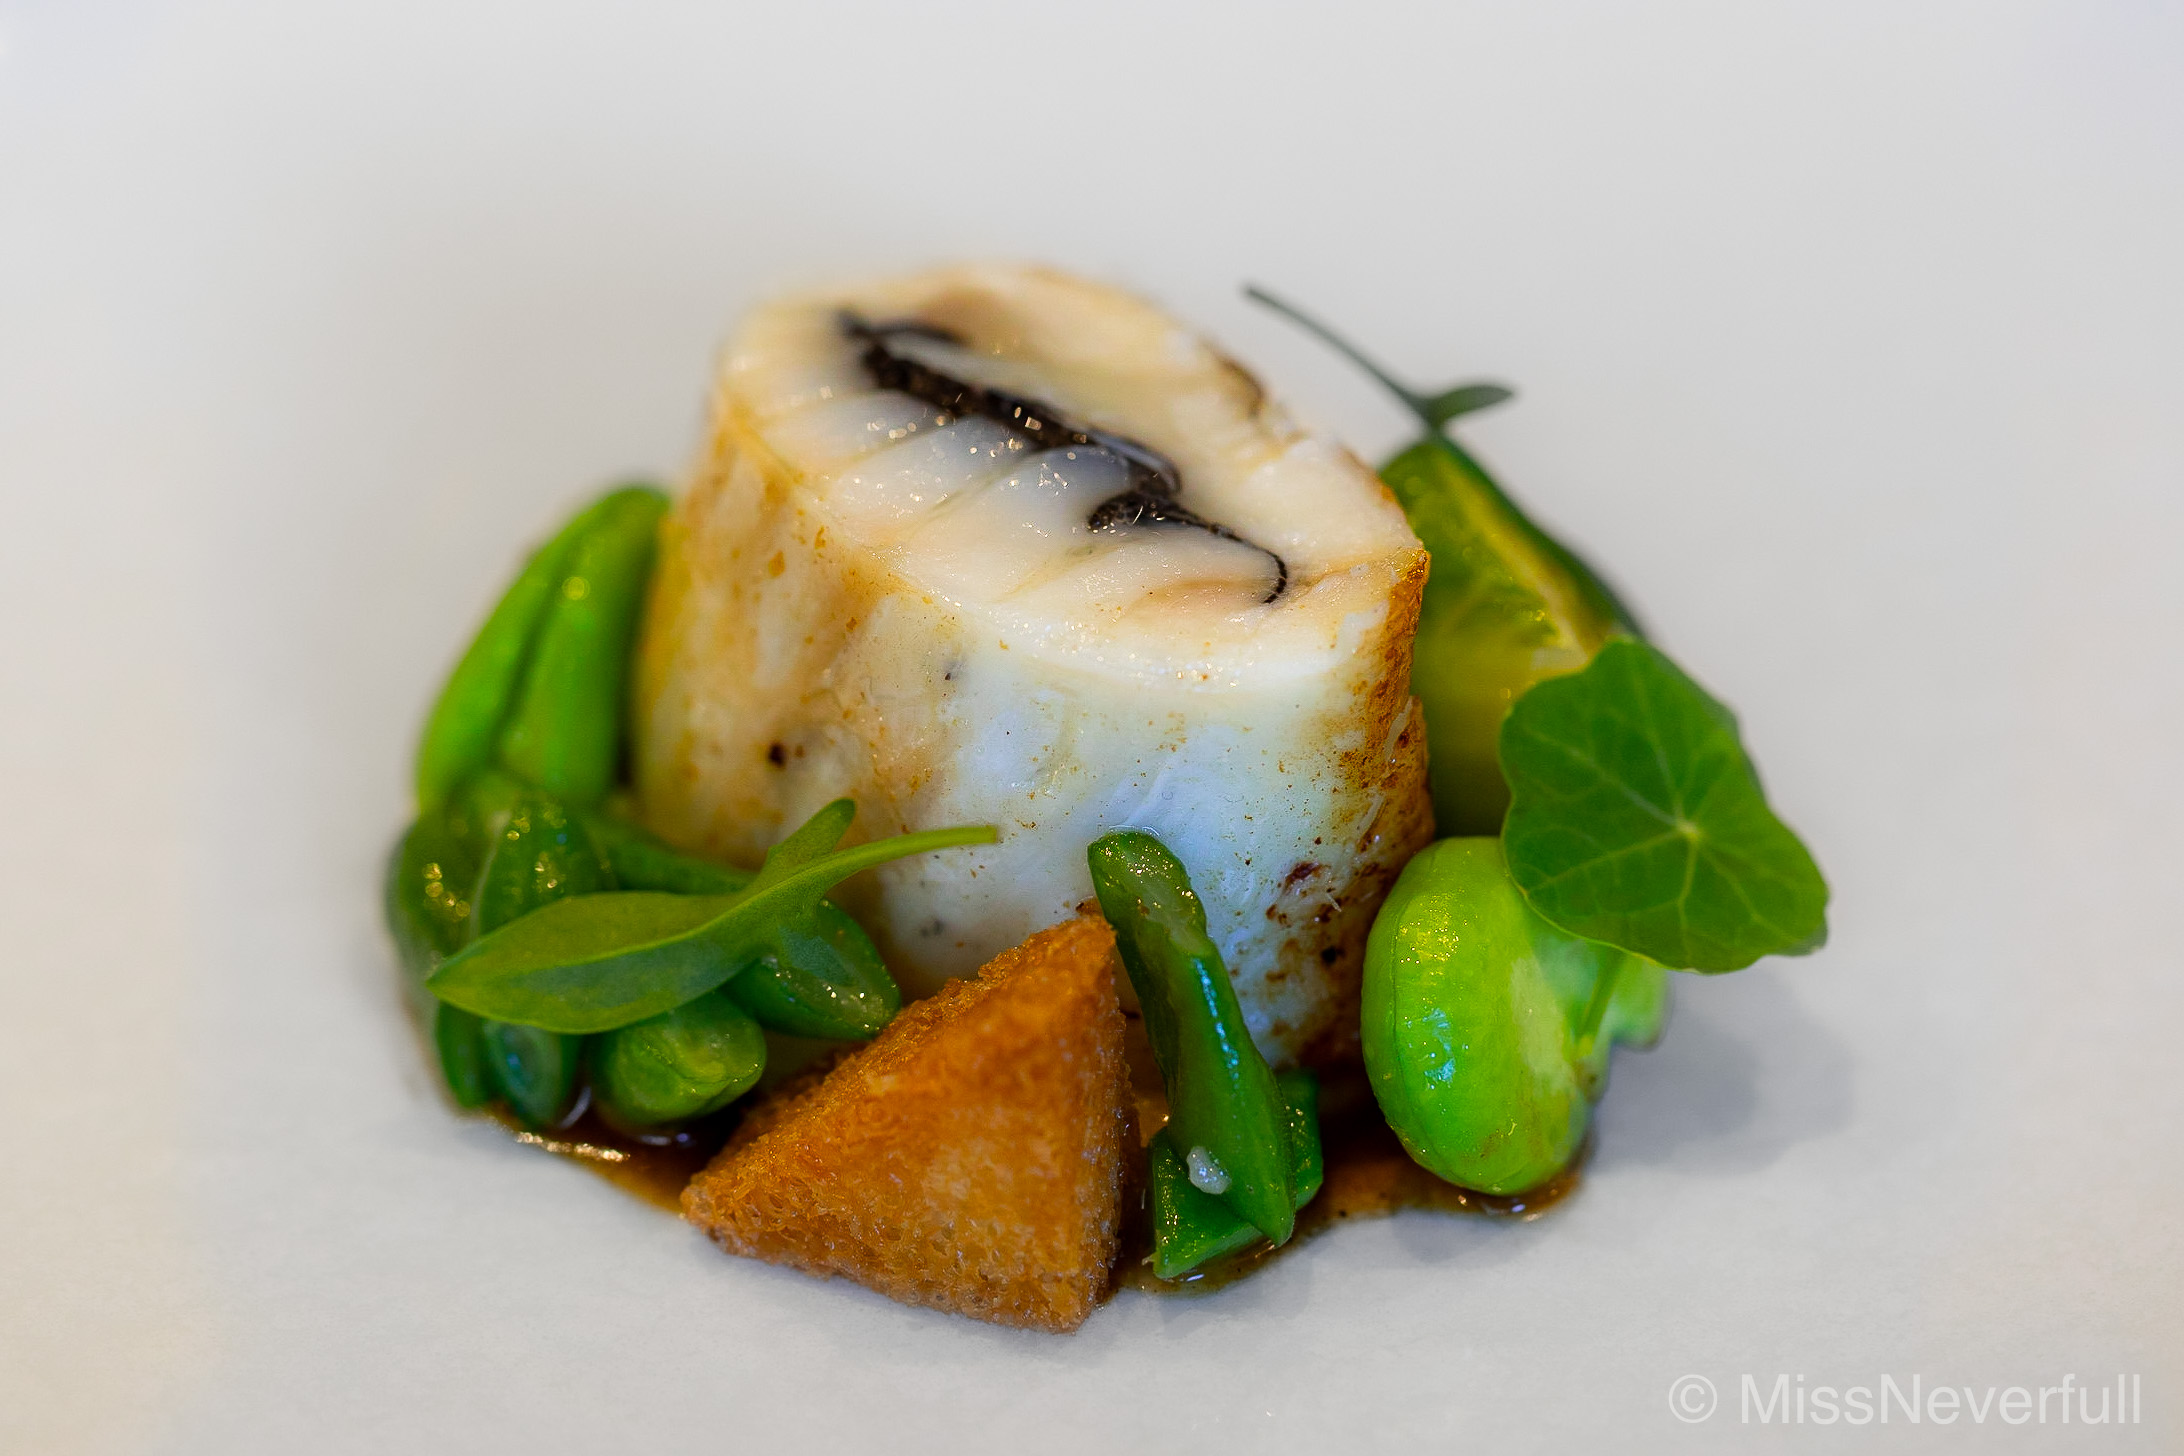 5. Hirame (Japanese flounder), Broad Beans, Crutons